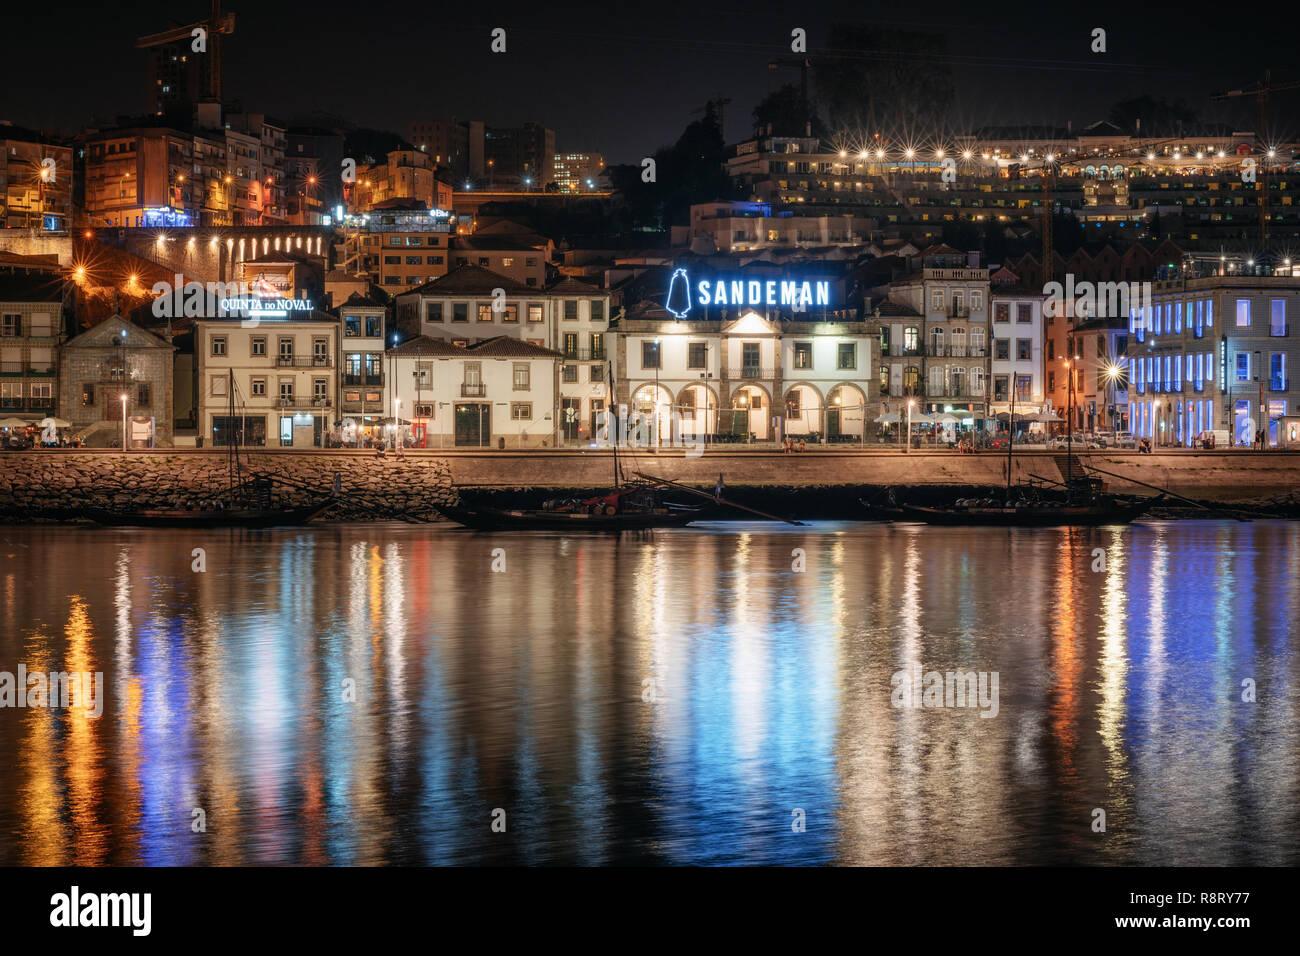 Vila Nova de Gaia, Porto, Lisbon - September 27, 2018: Panoramic view of Douro river embankment and Vila Nova de Gaia with House of Sandeman from the  - Stock Image